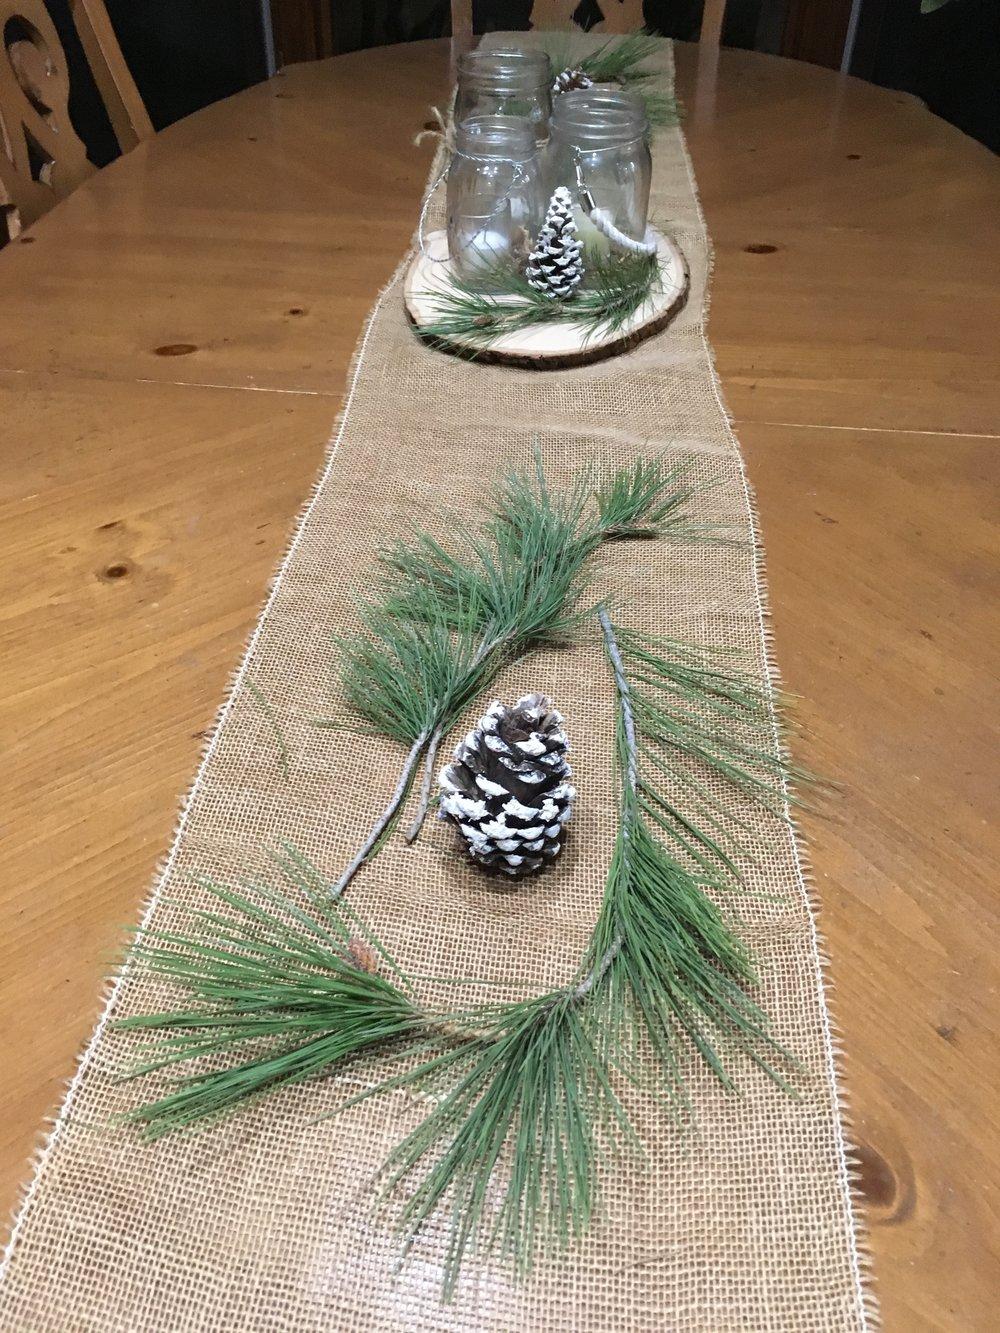 Simple table decorations - tammyblomsterberg.com.JPG